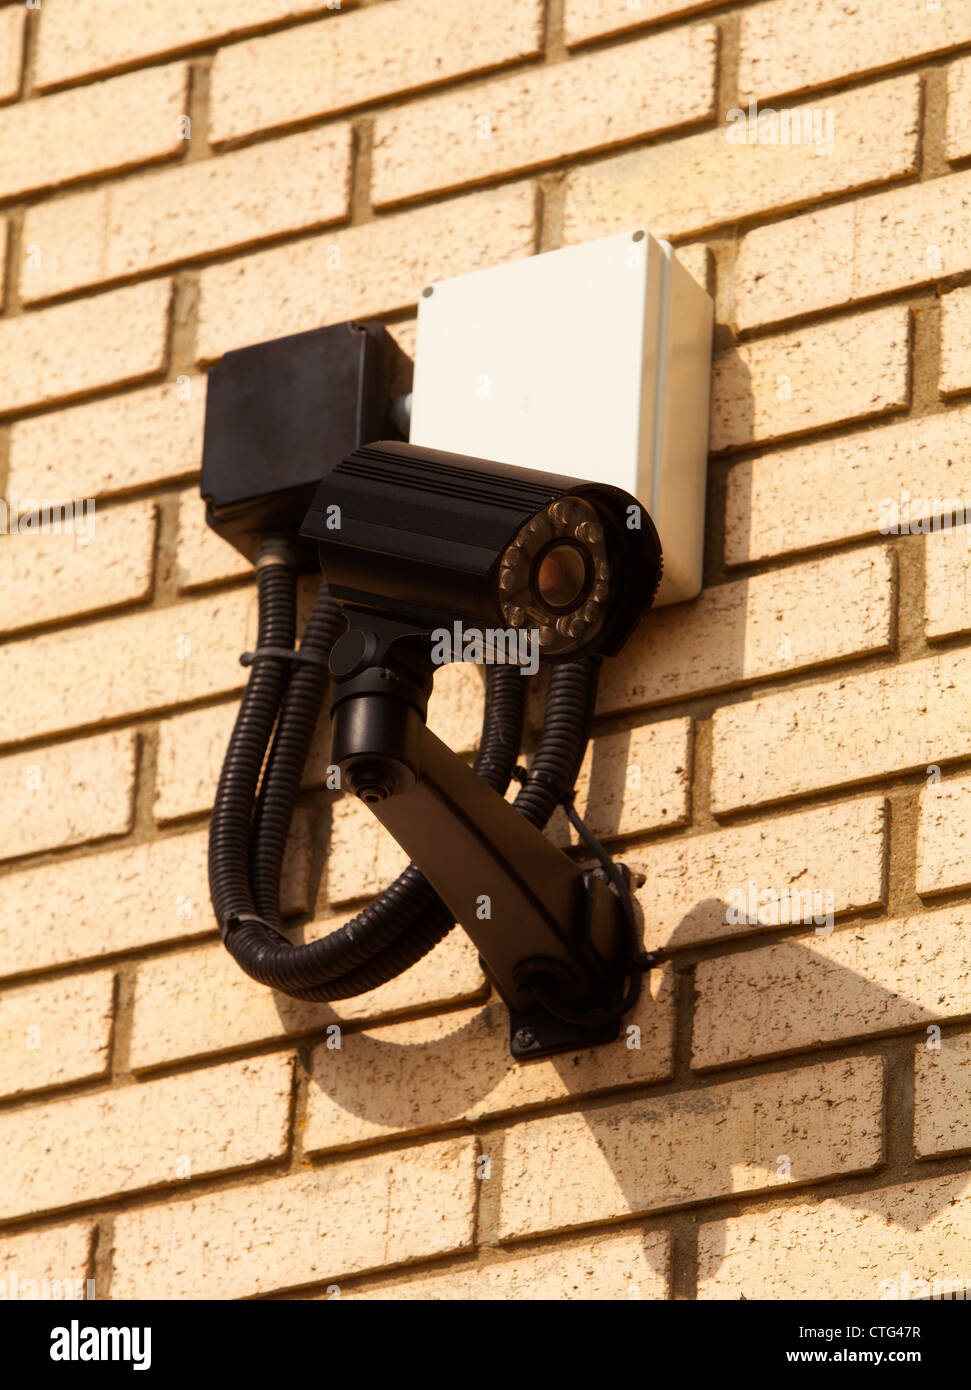 A close up of a wall mounted CCTV camera - Stock Image